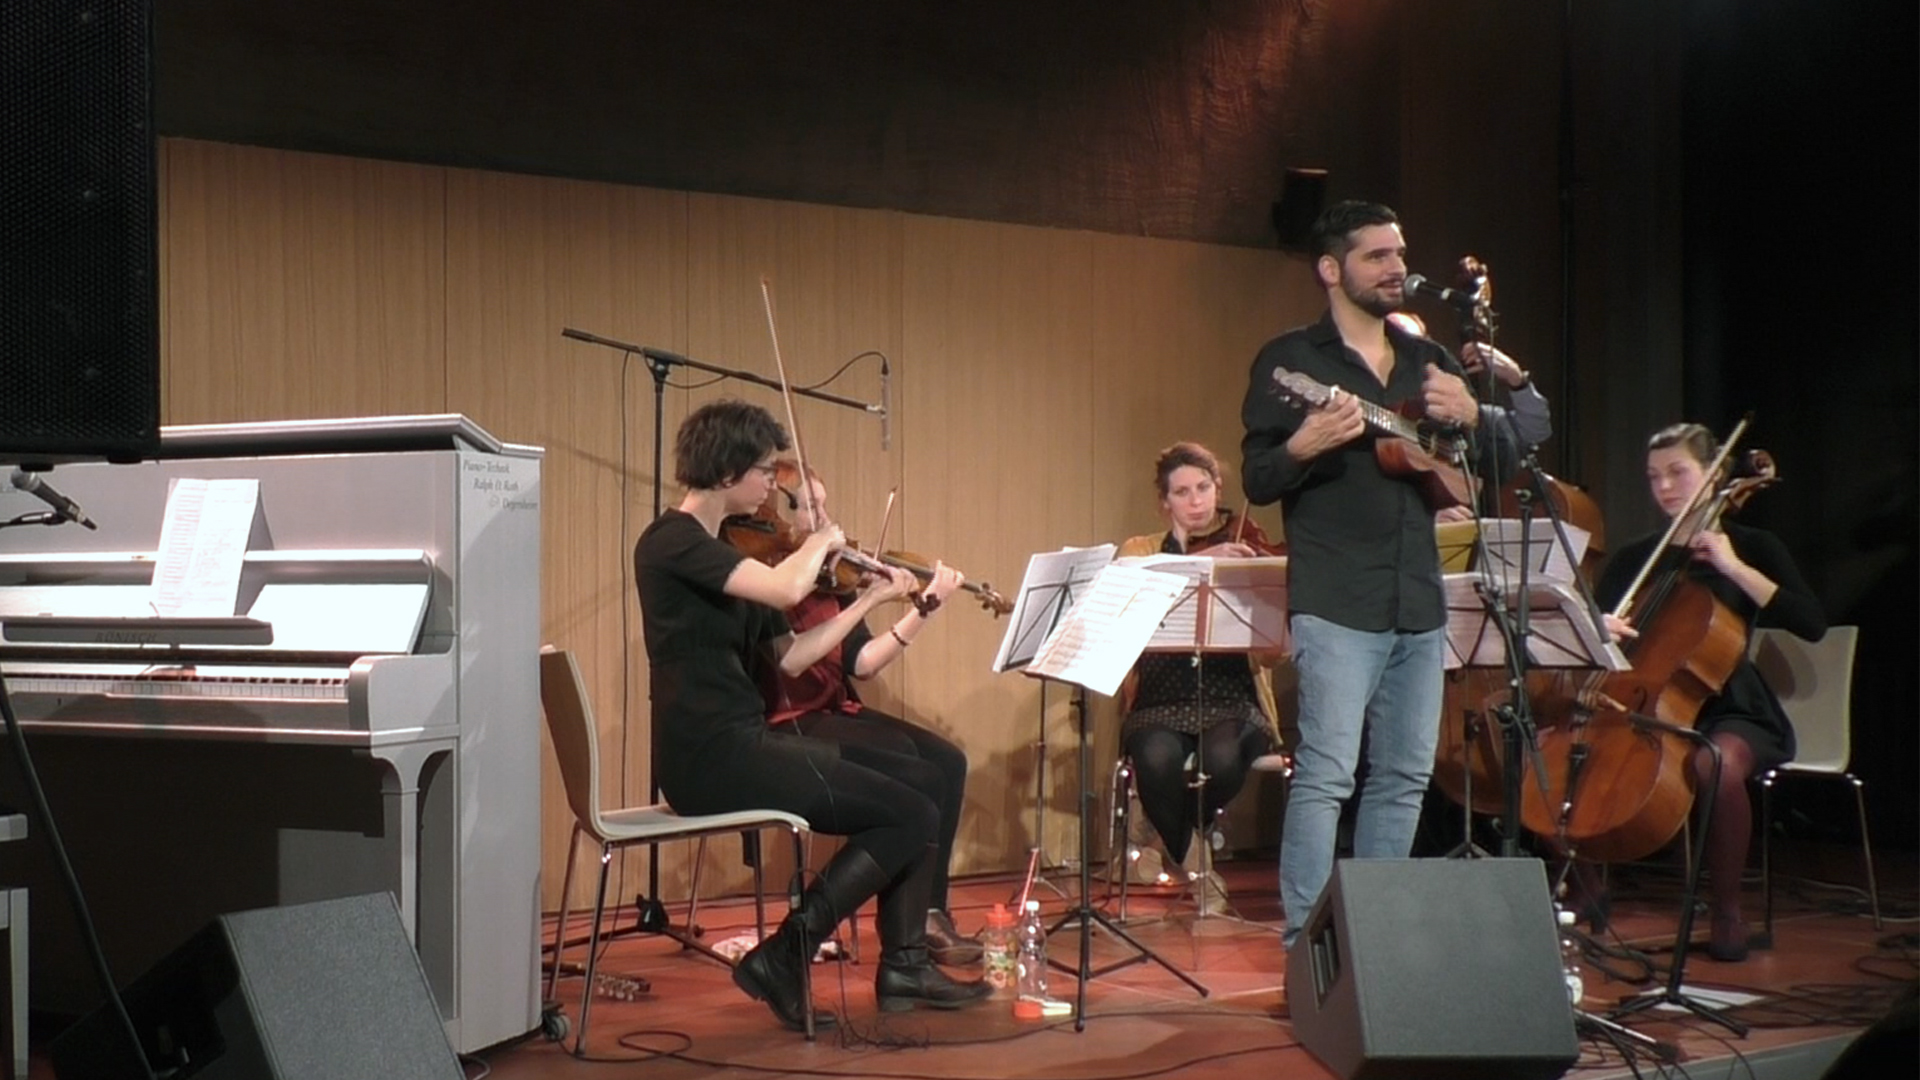 Concert du 26 janvier 2017 en Appenzell